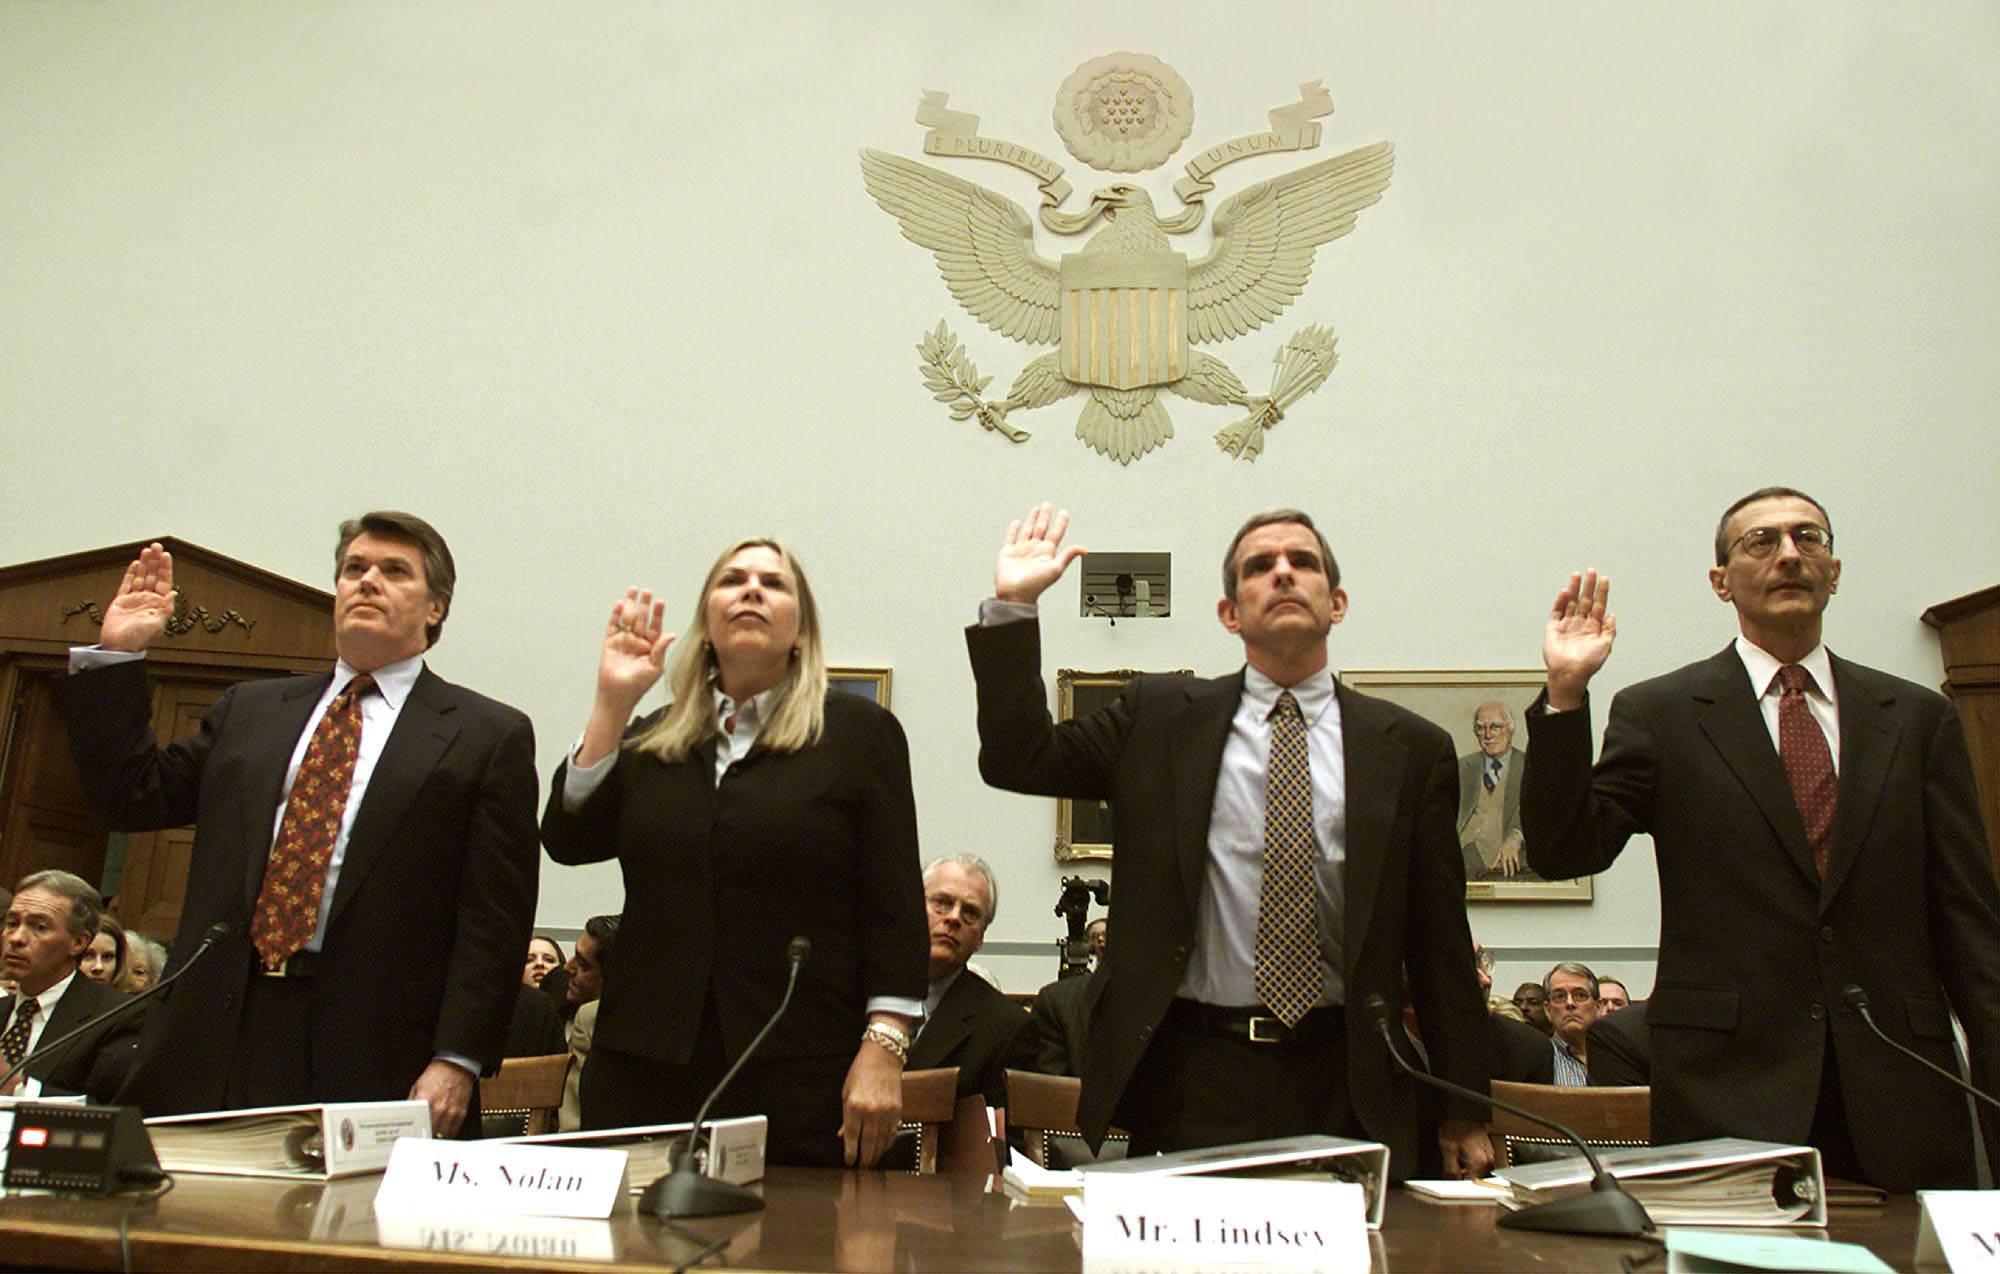 Clinton pardon of Marc Rich testimony